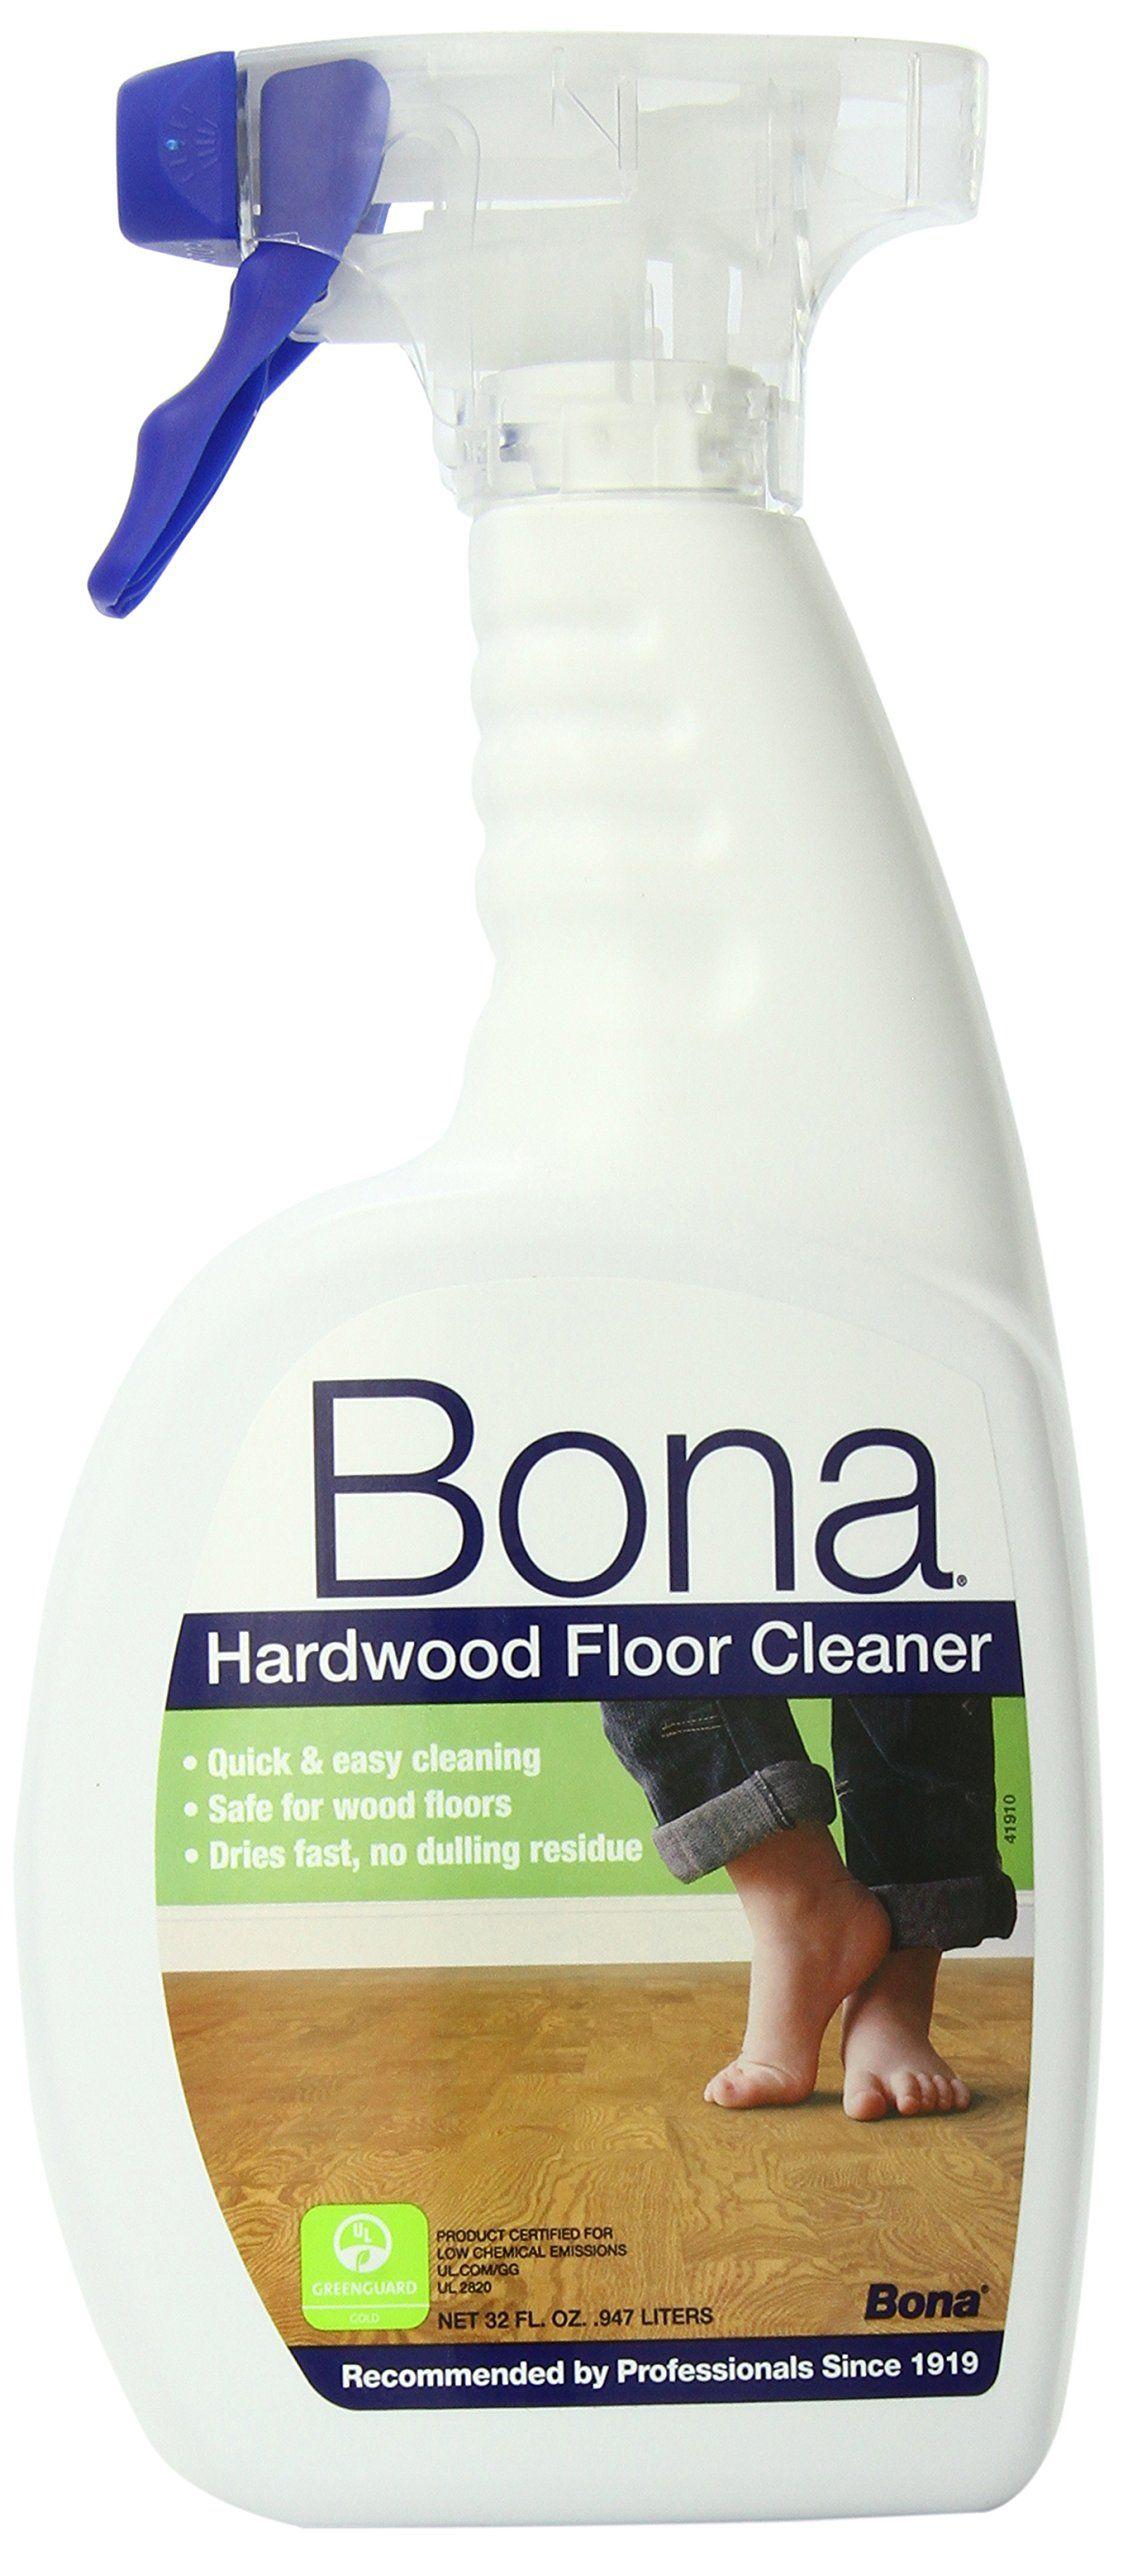 Bona Hardwood Floor Cleaner Spray, 32 oz. Use Bona